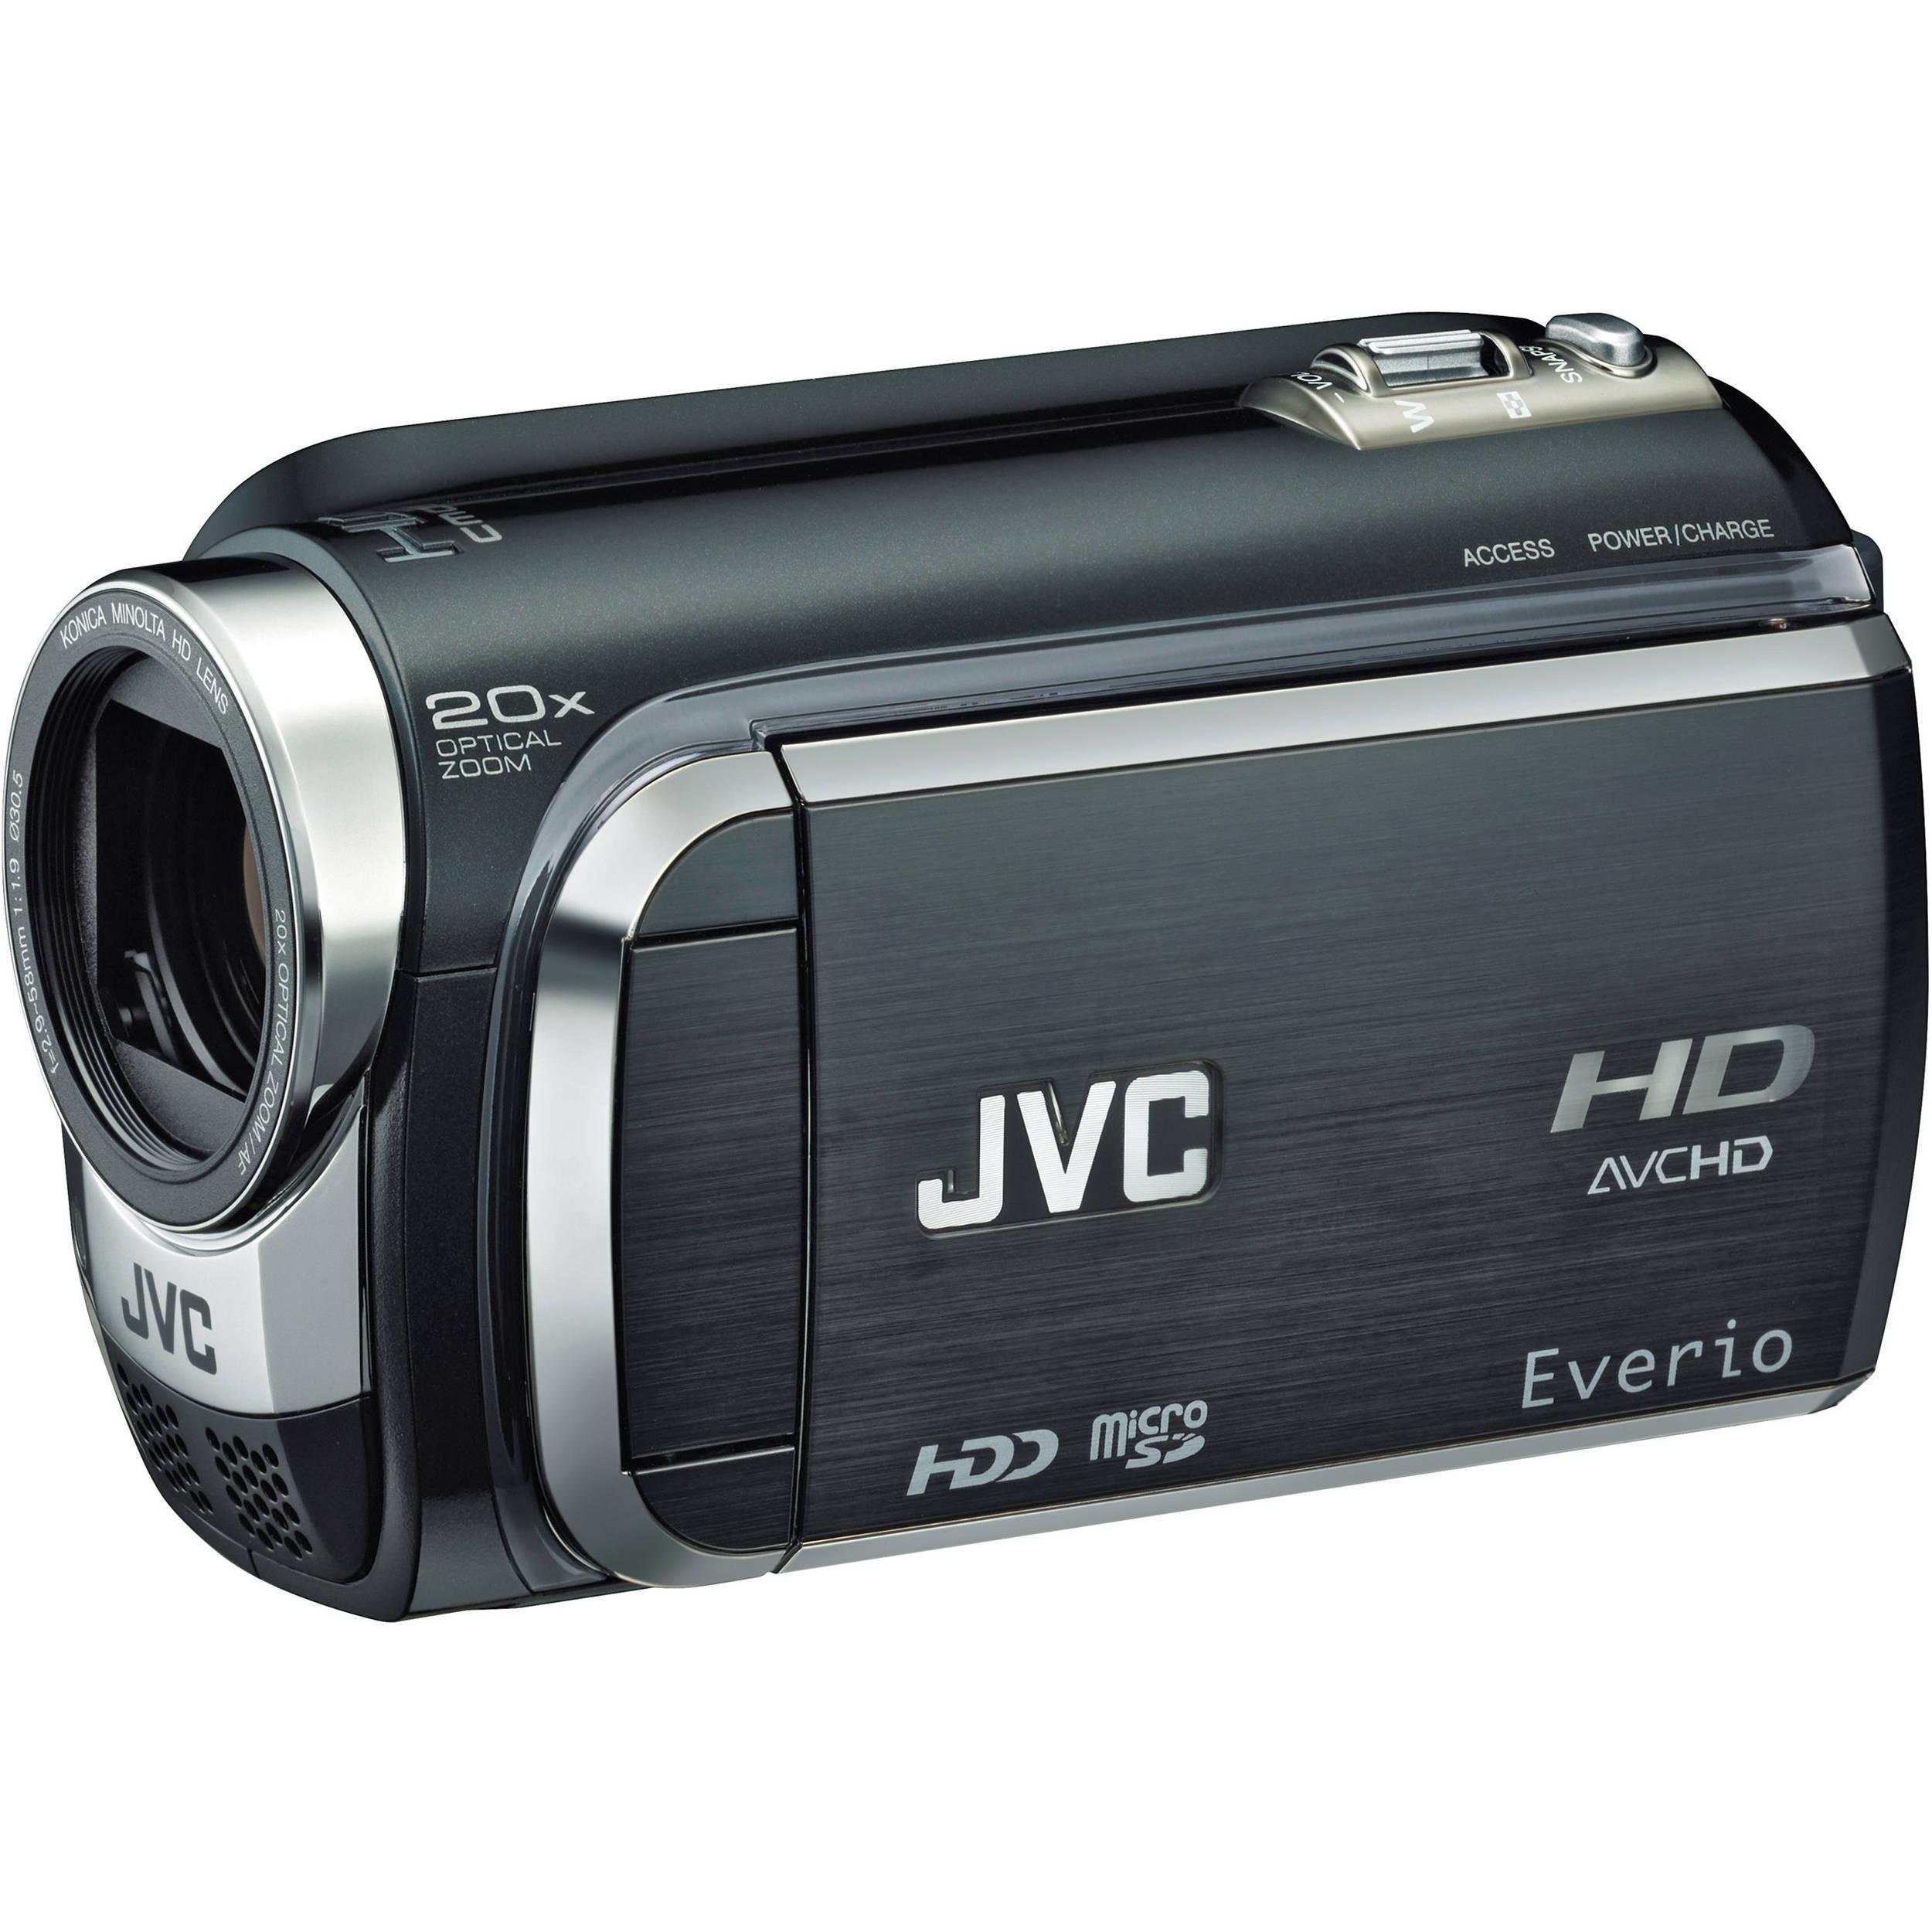 JVC GZ-HD320 Everio High Definition Hard Disk GZ-HD320B B&H